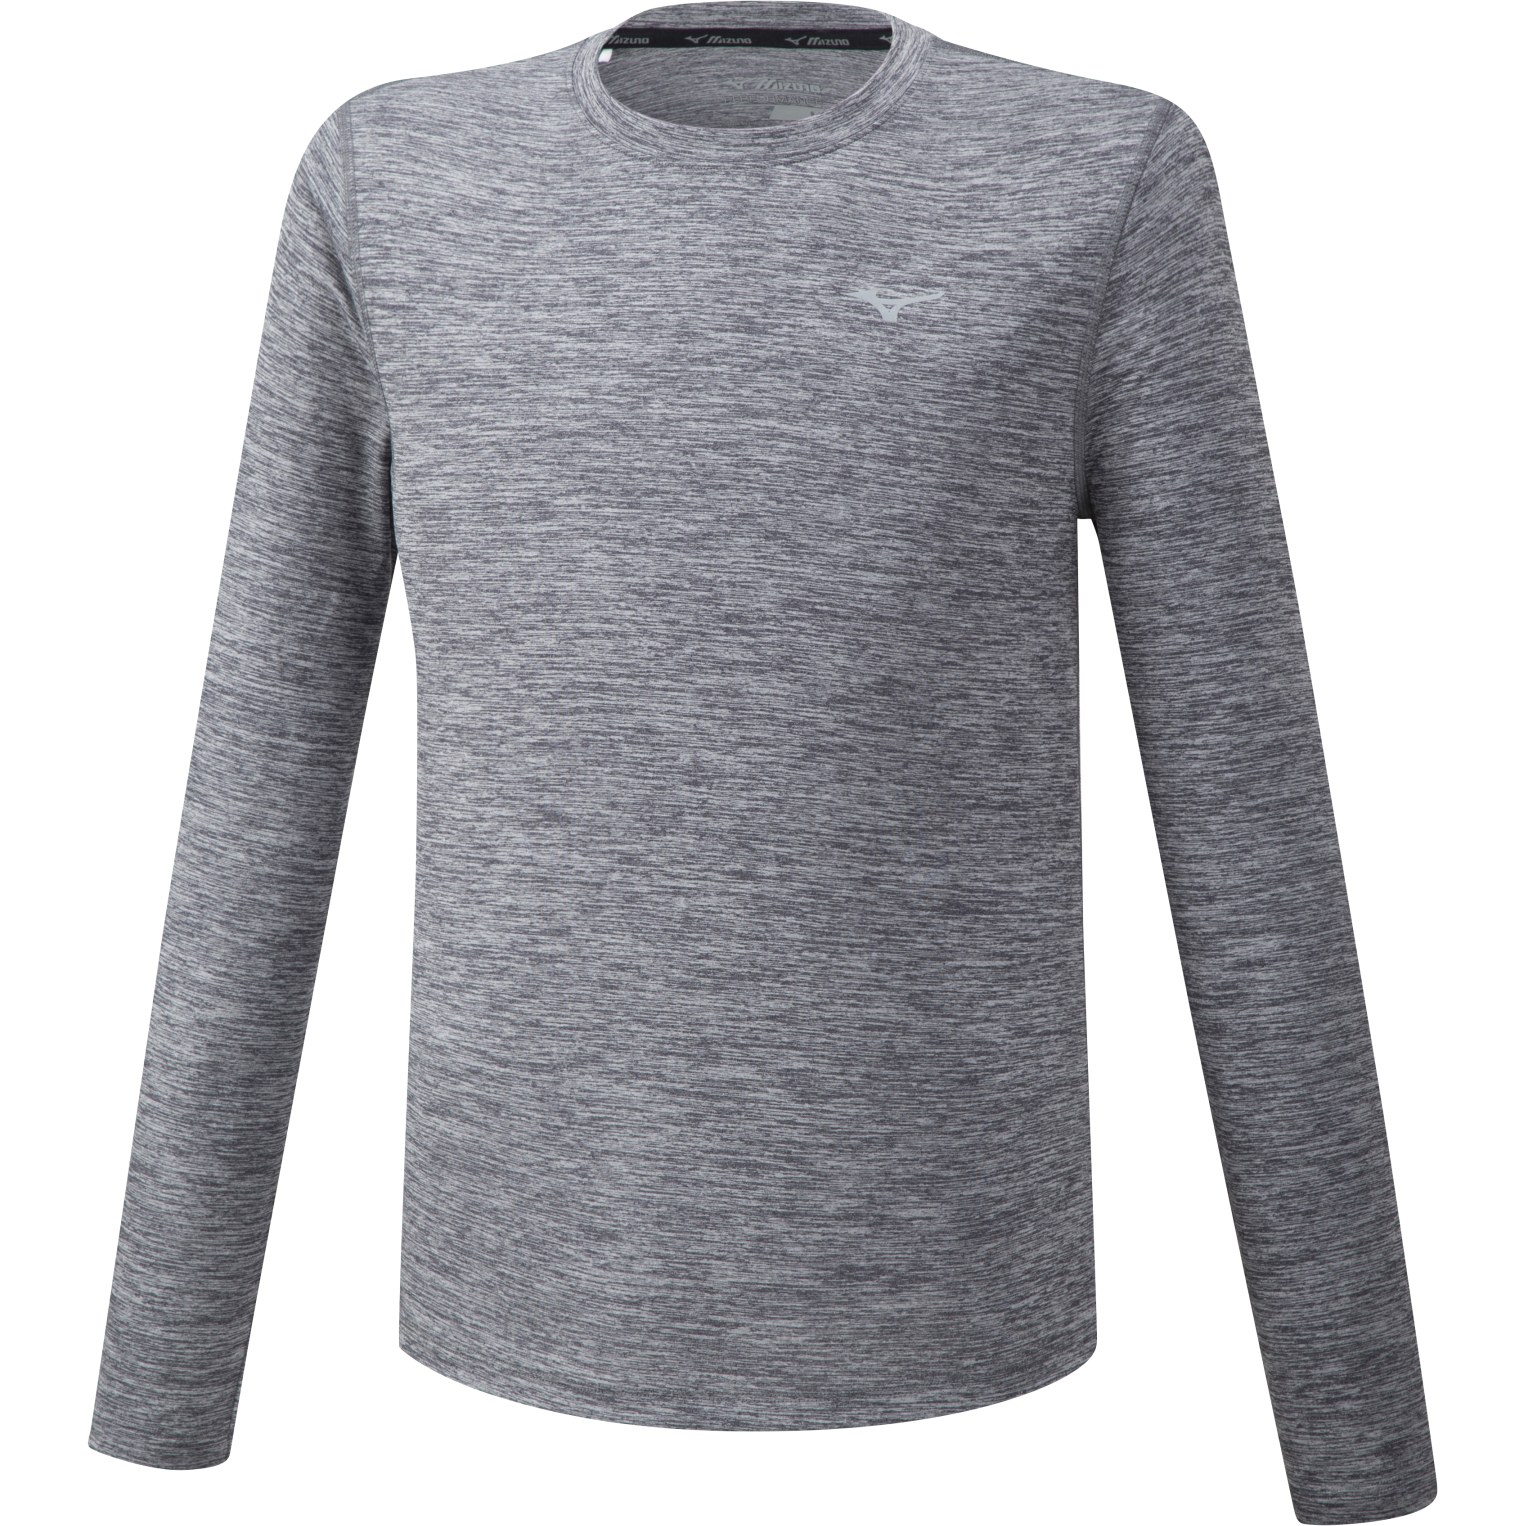 Mizuno Impulse Core Long-Sleeve Shirt - Magnet